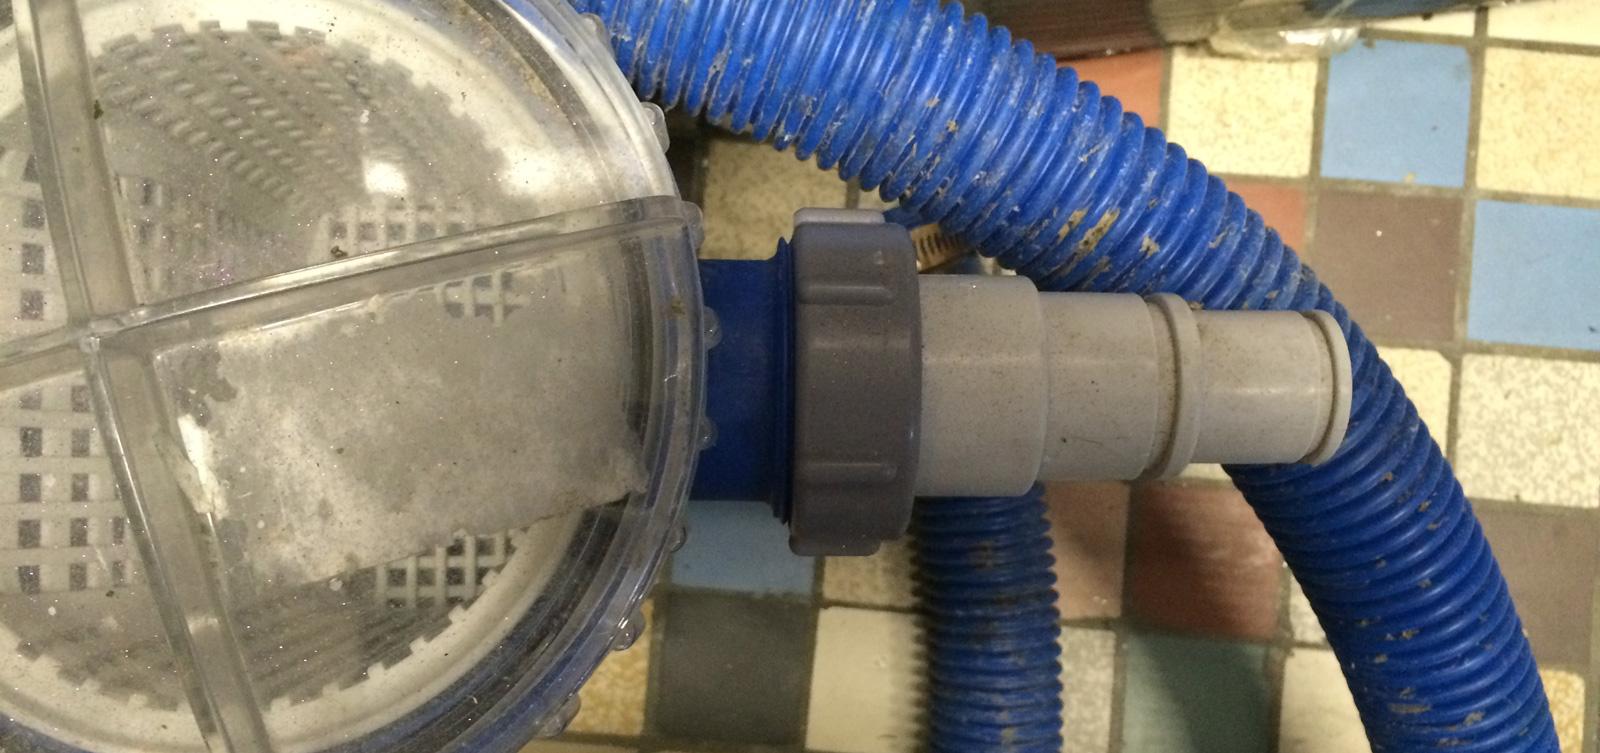 Raccord pvc piscine raccord et tuyau pour piscine prix for Raccord filtration piscine